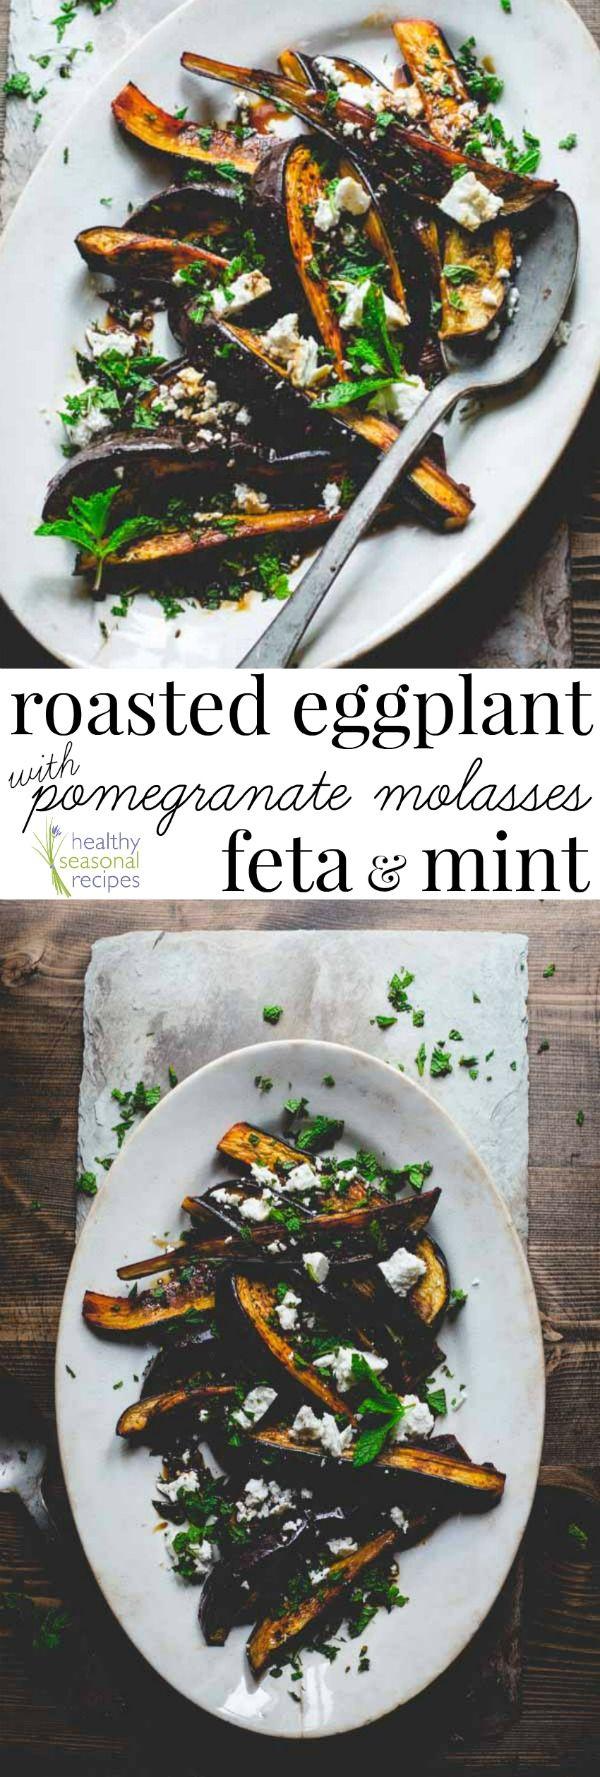 roasted eggplant with pomegranate molasses feta and mint - Healthy Seasonal Recipes